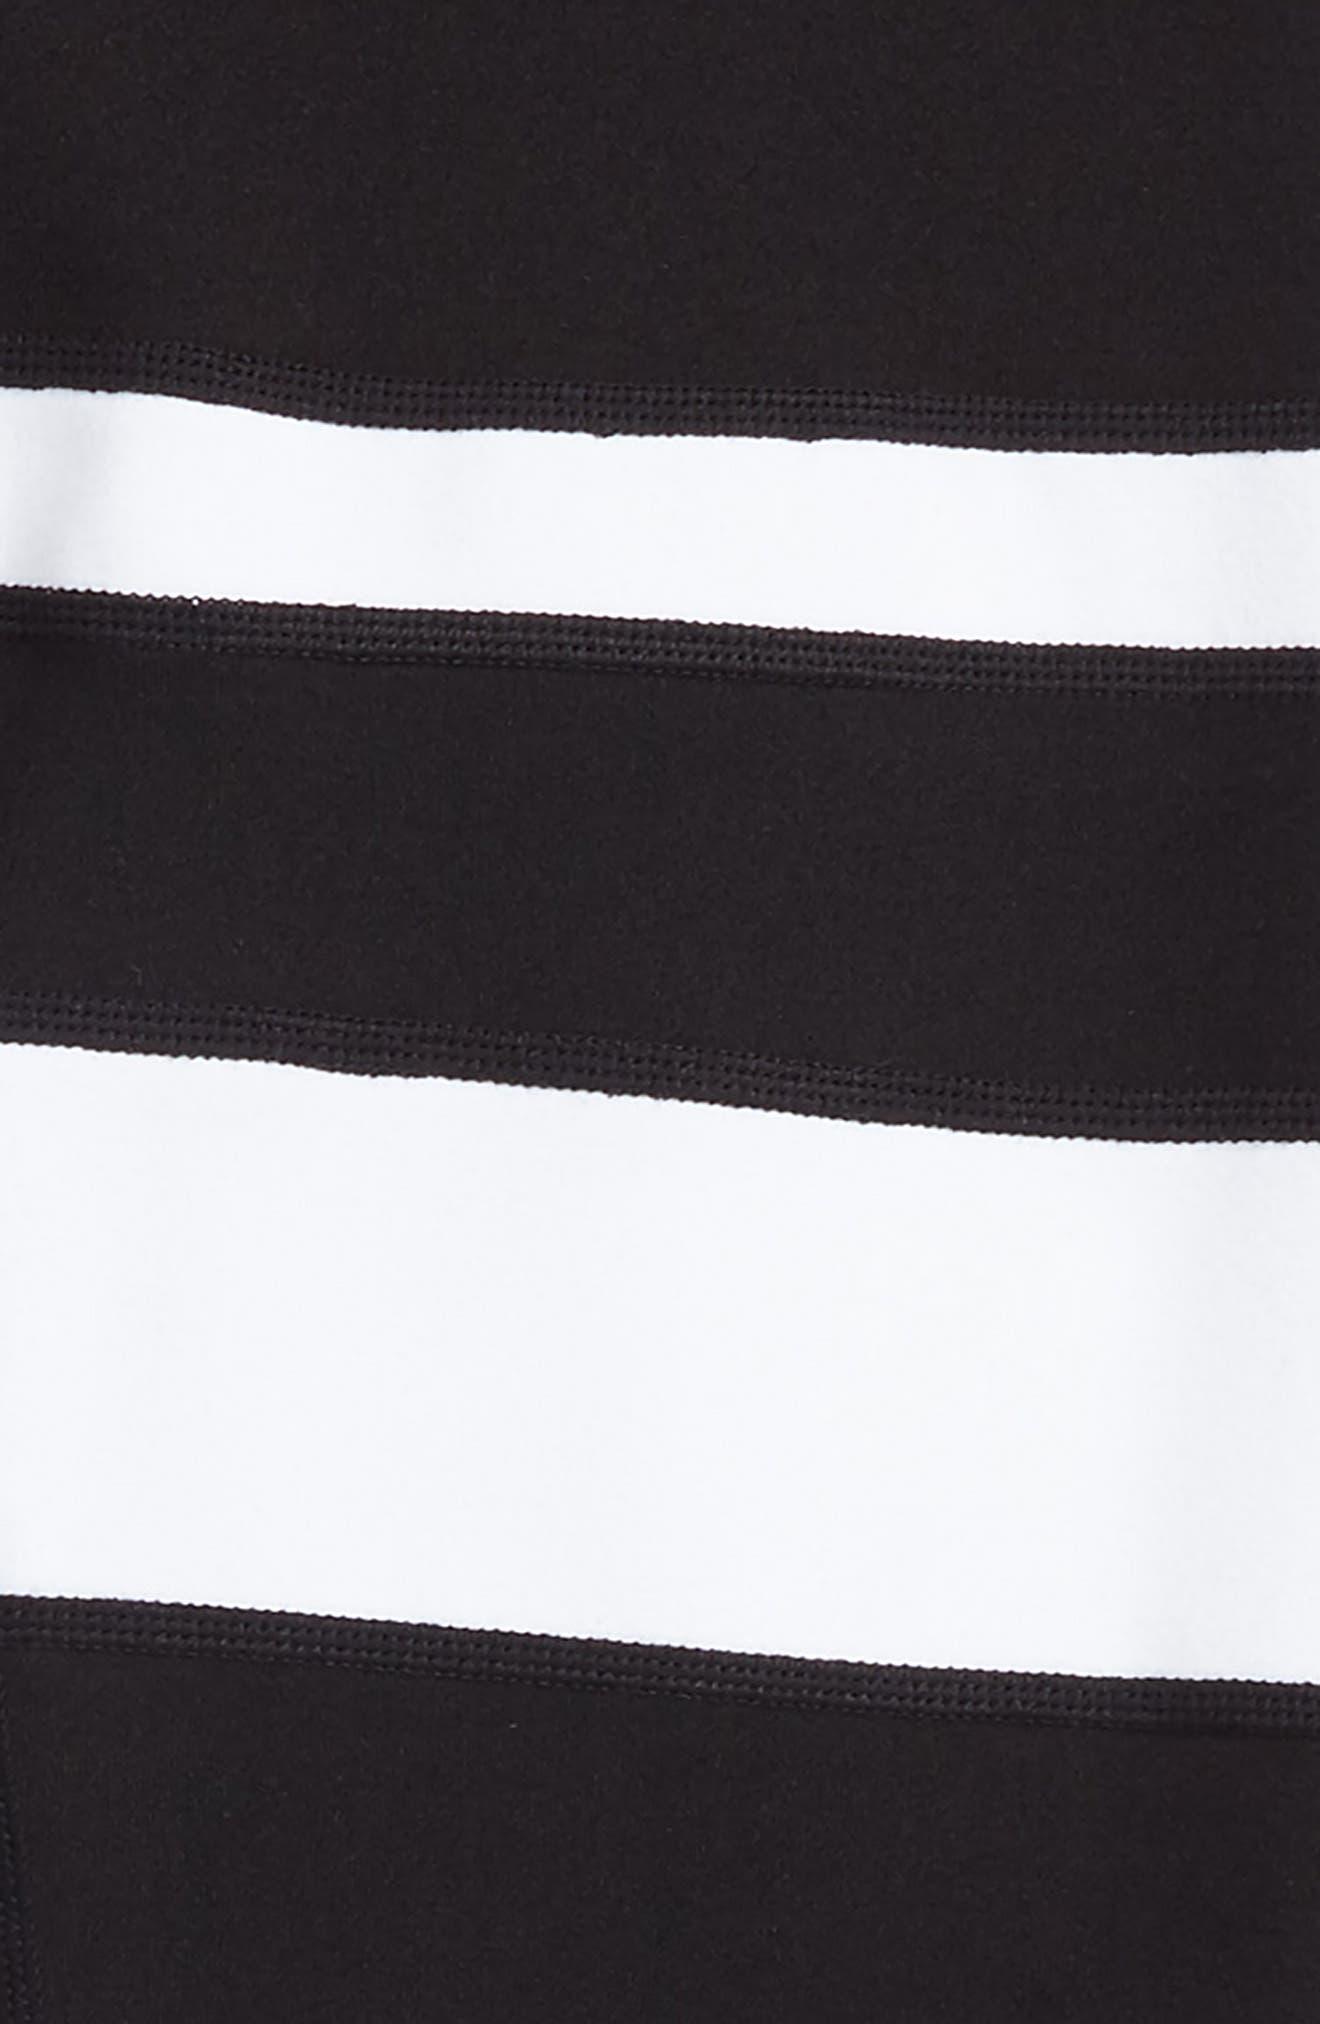 Zella Stripe Leggings,                             Alternate thumbnail 2, color,                             001